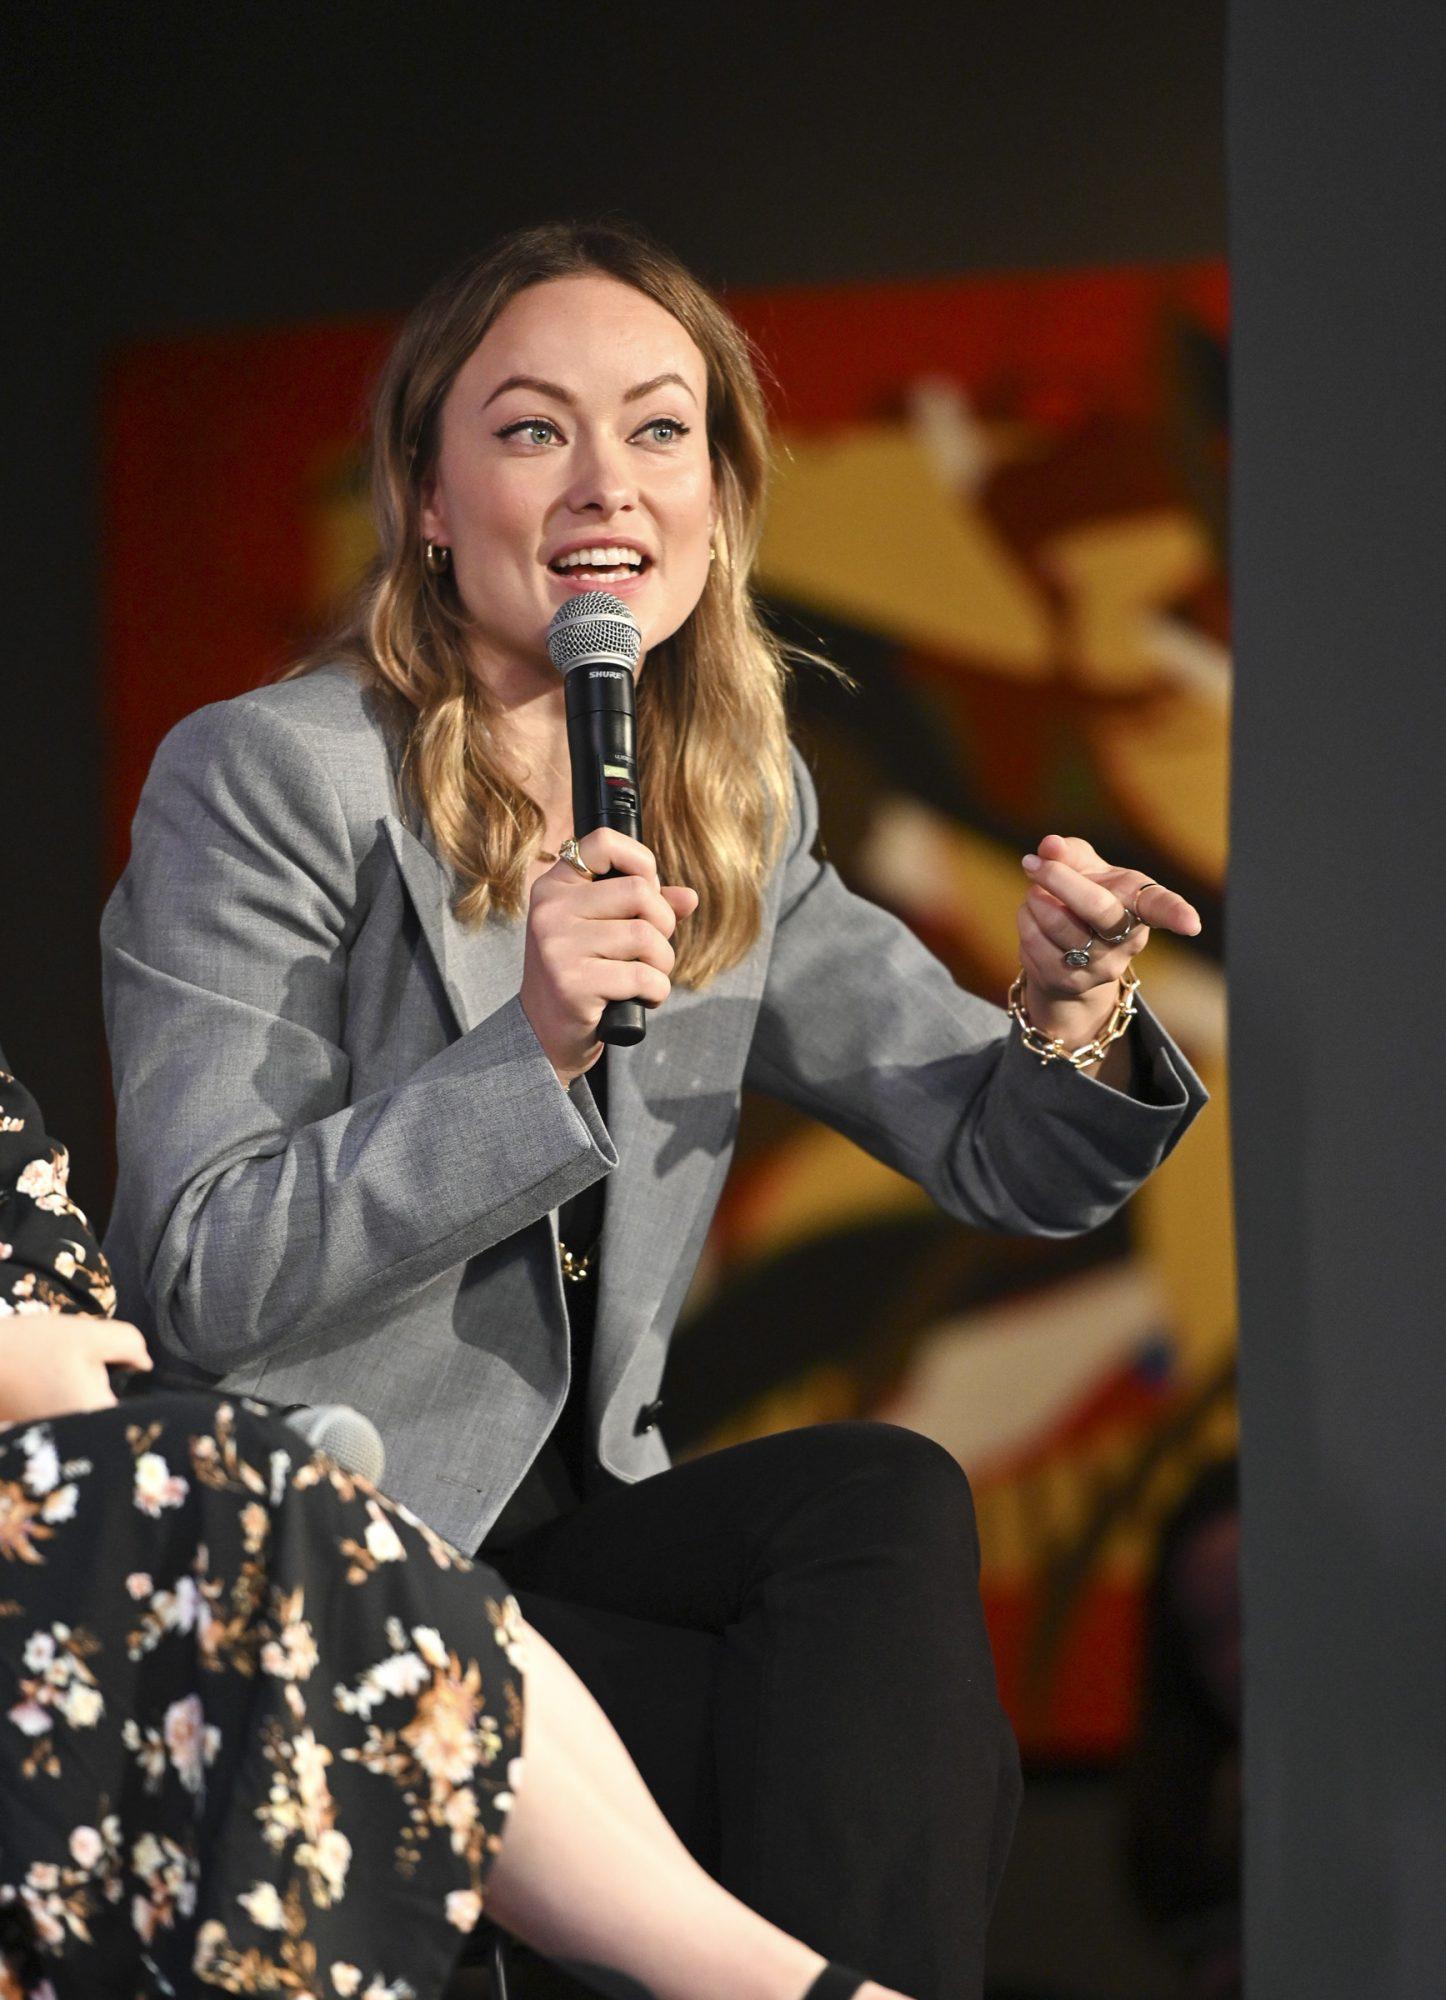 22nd SCAD Savannah Film Festival - Wonder Women Panels